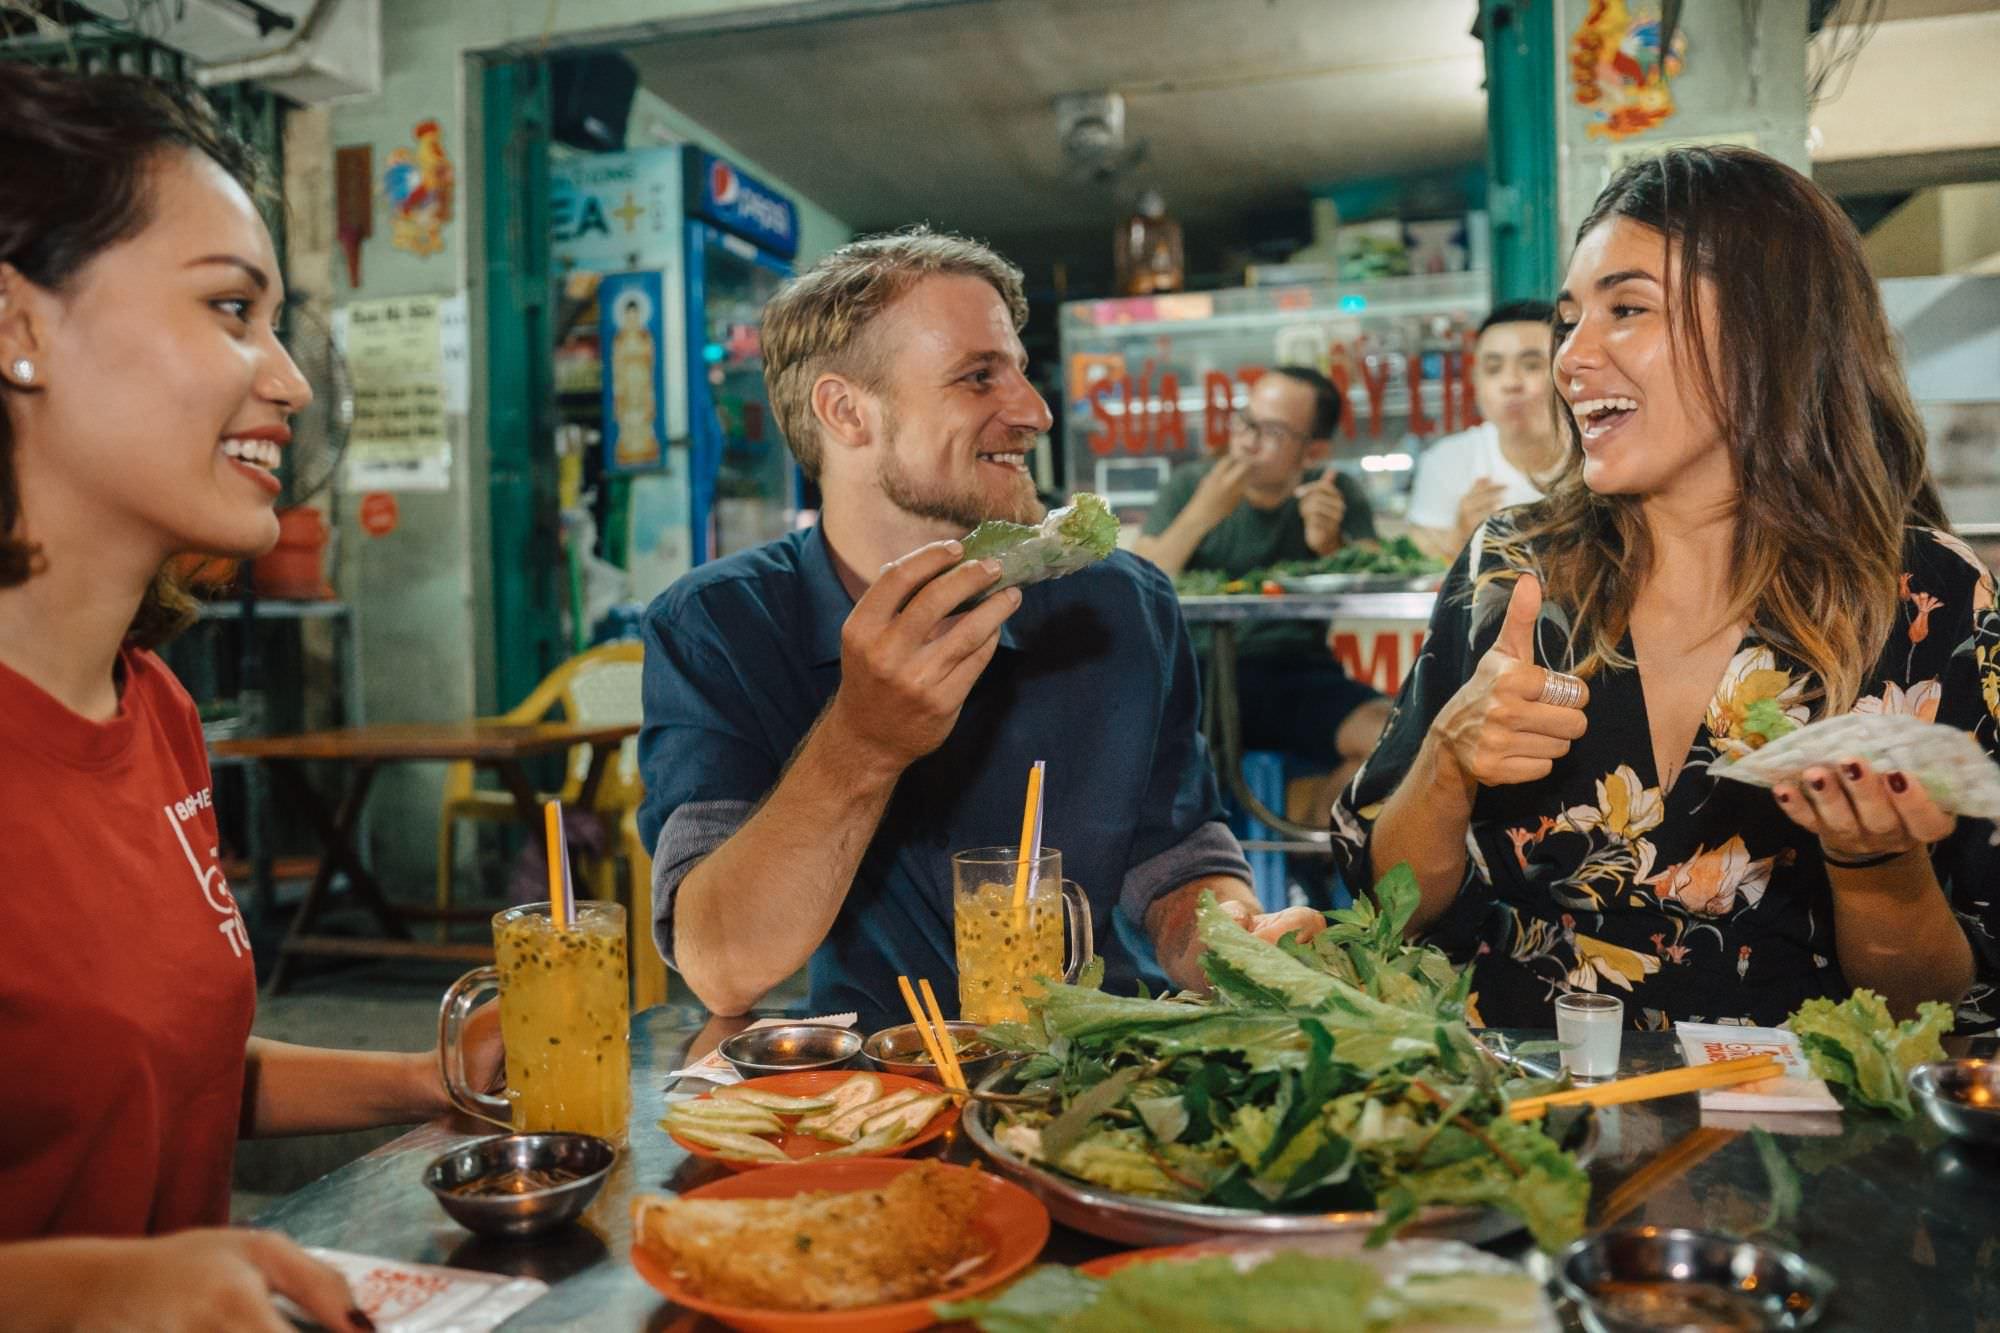 Ho Chi Minh City Food Tour at Night with Banh Xeo